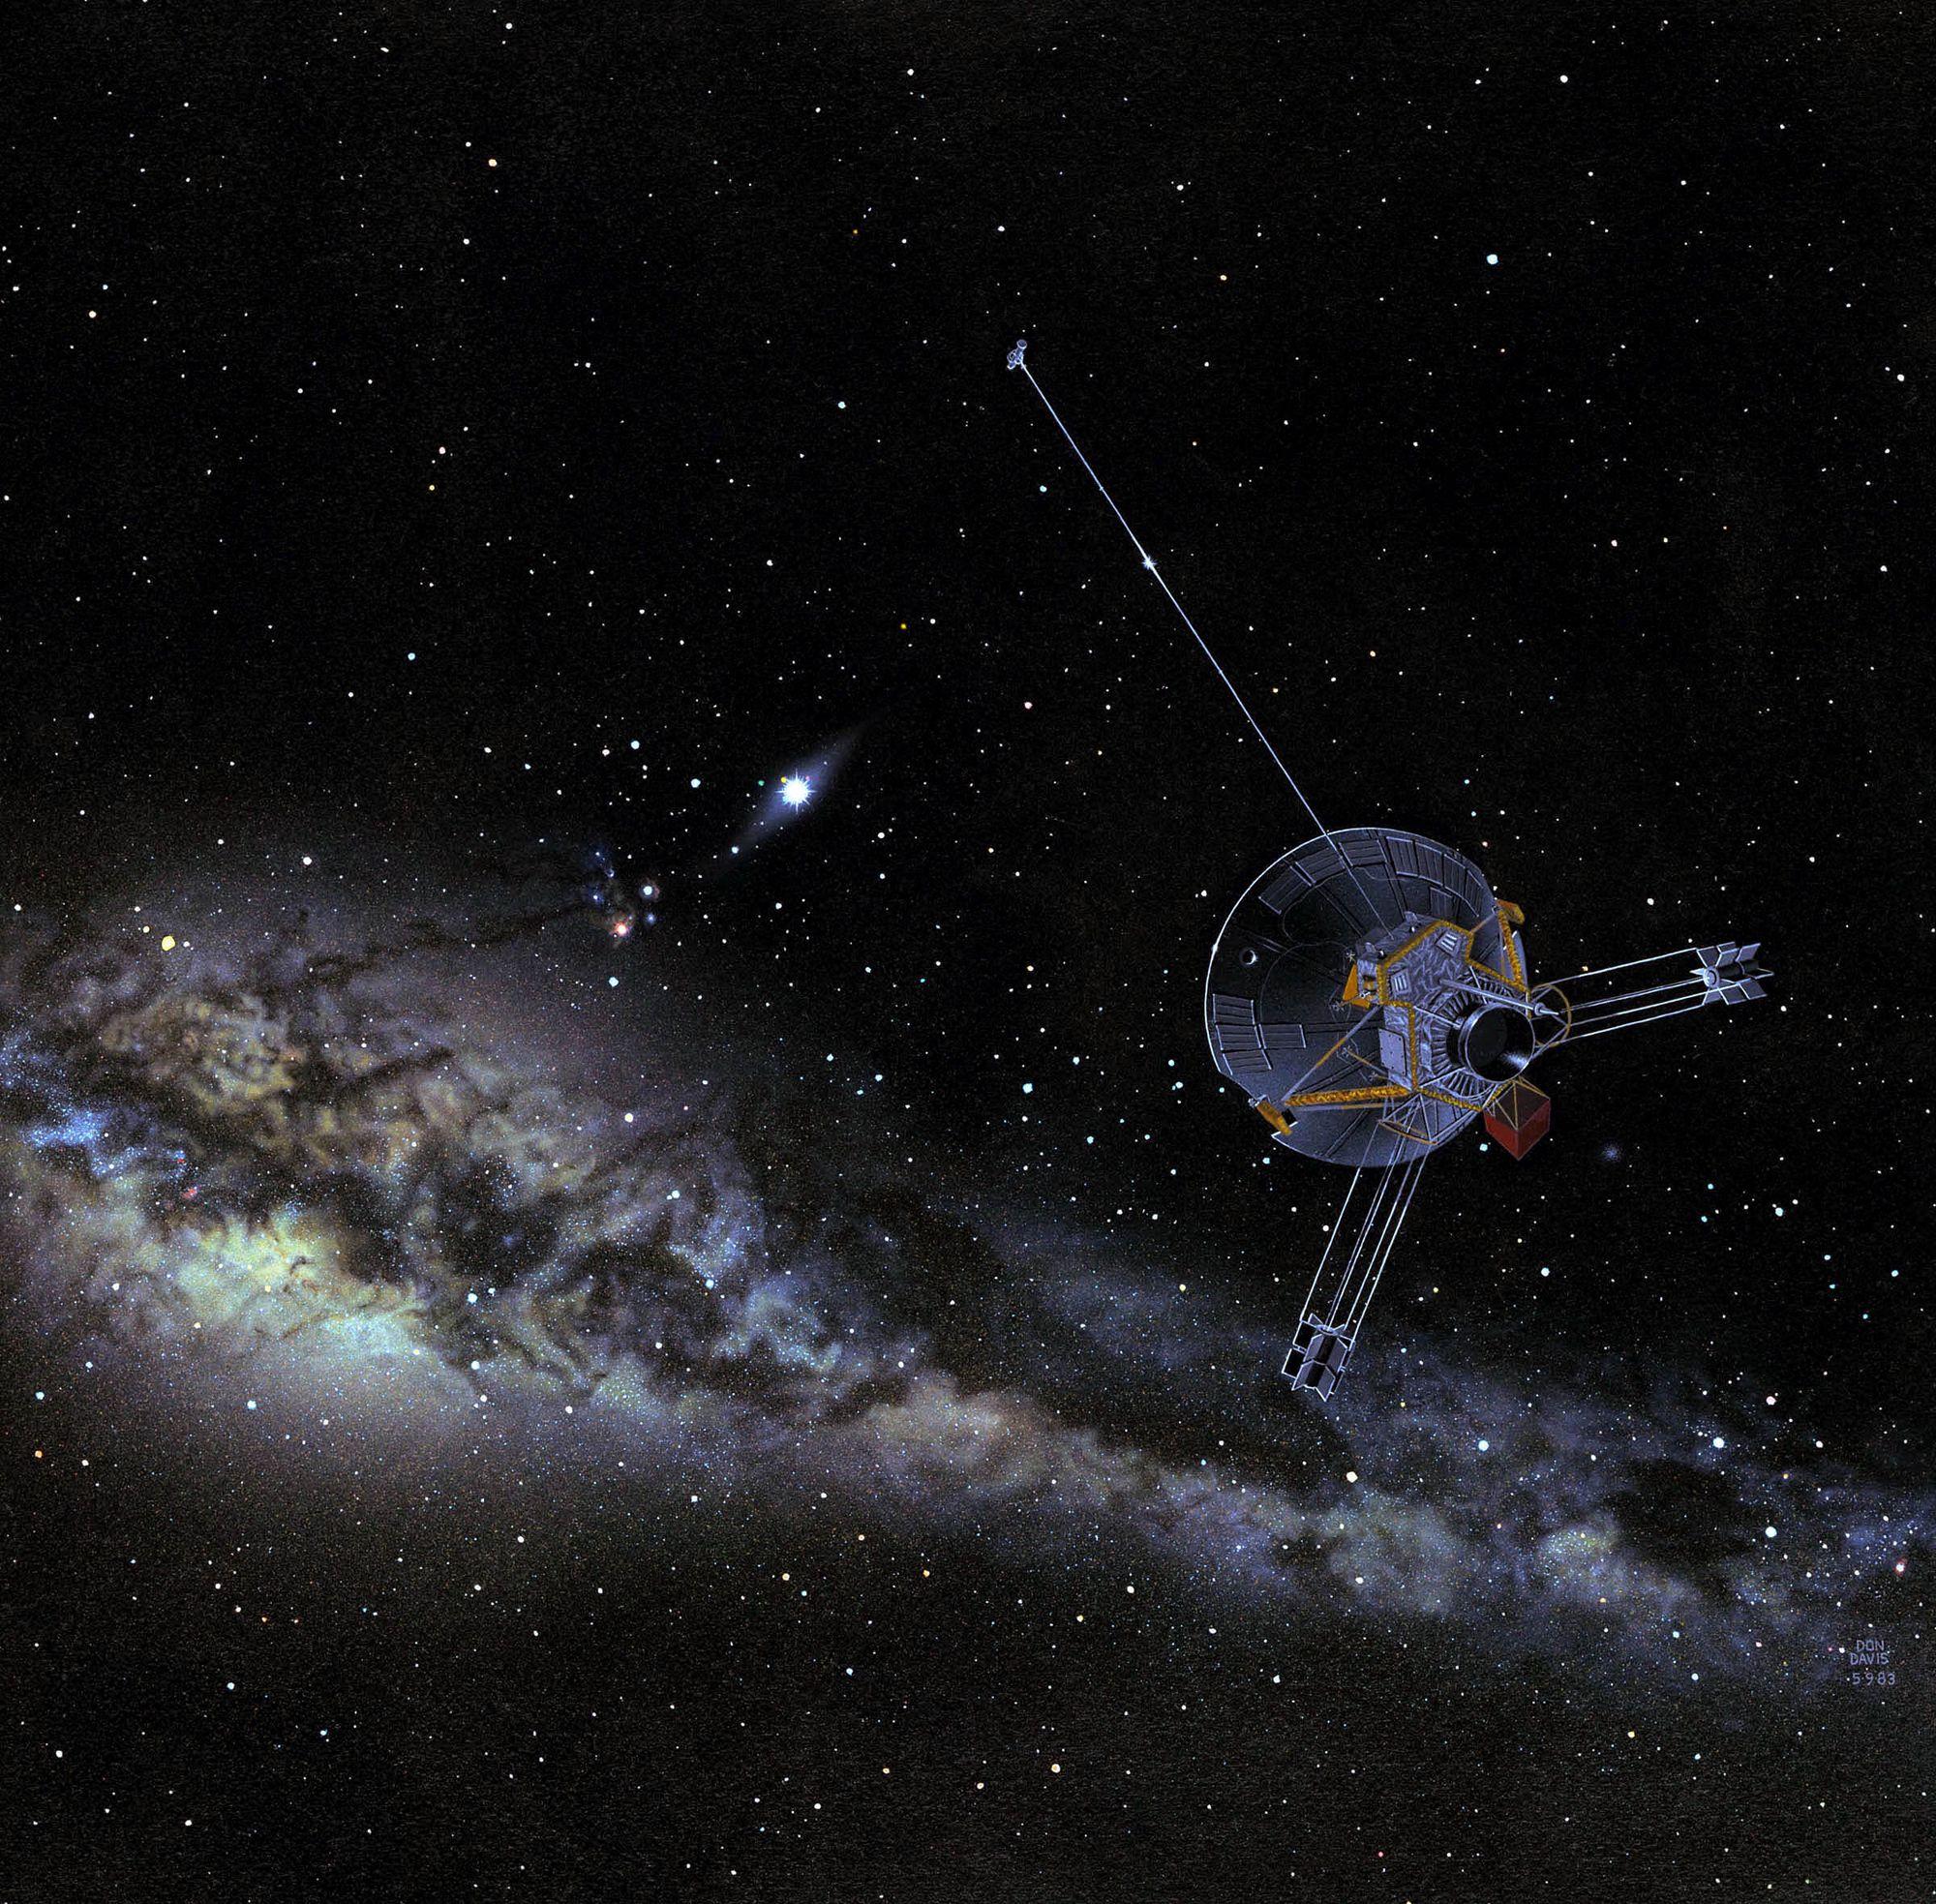 Cress's satellite